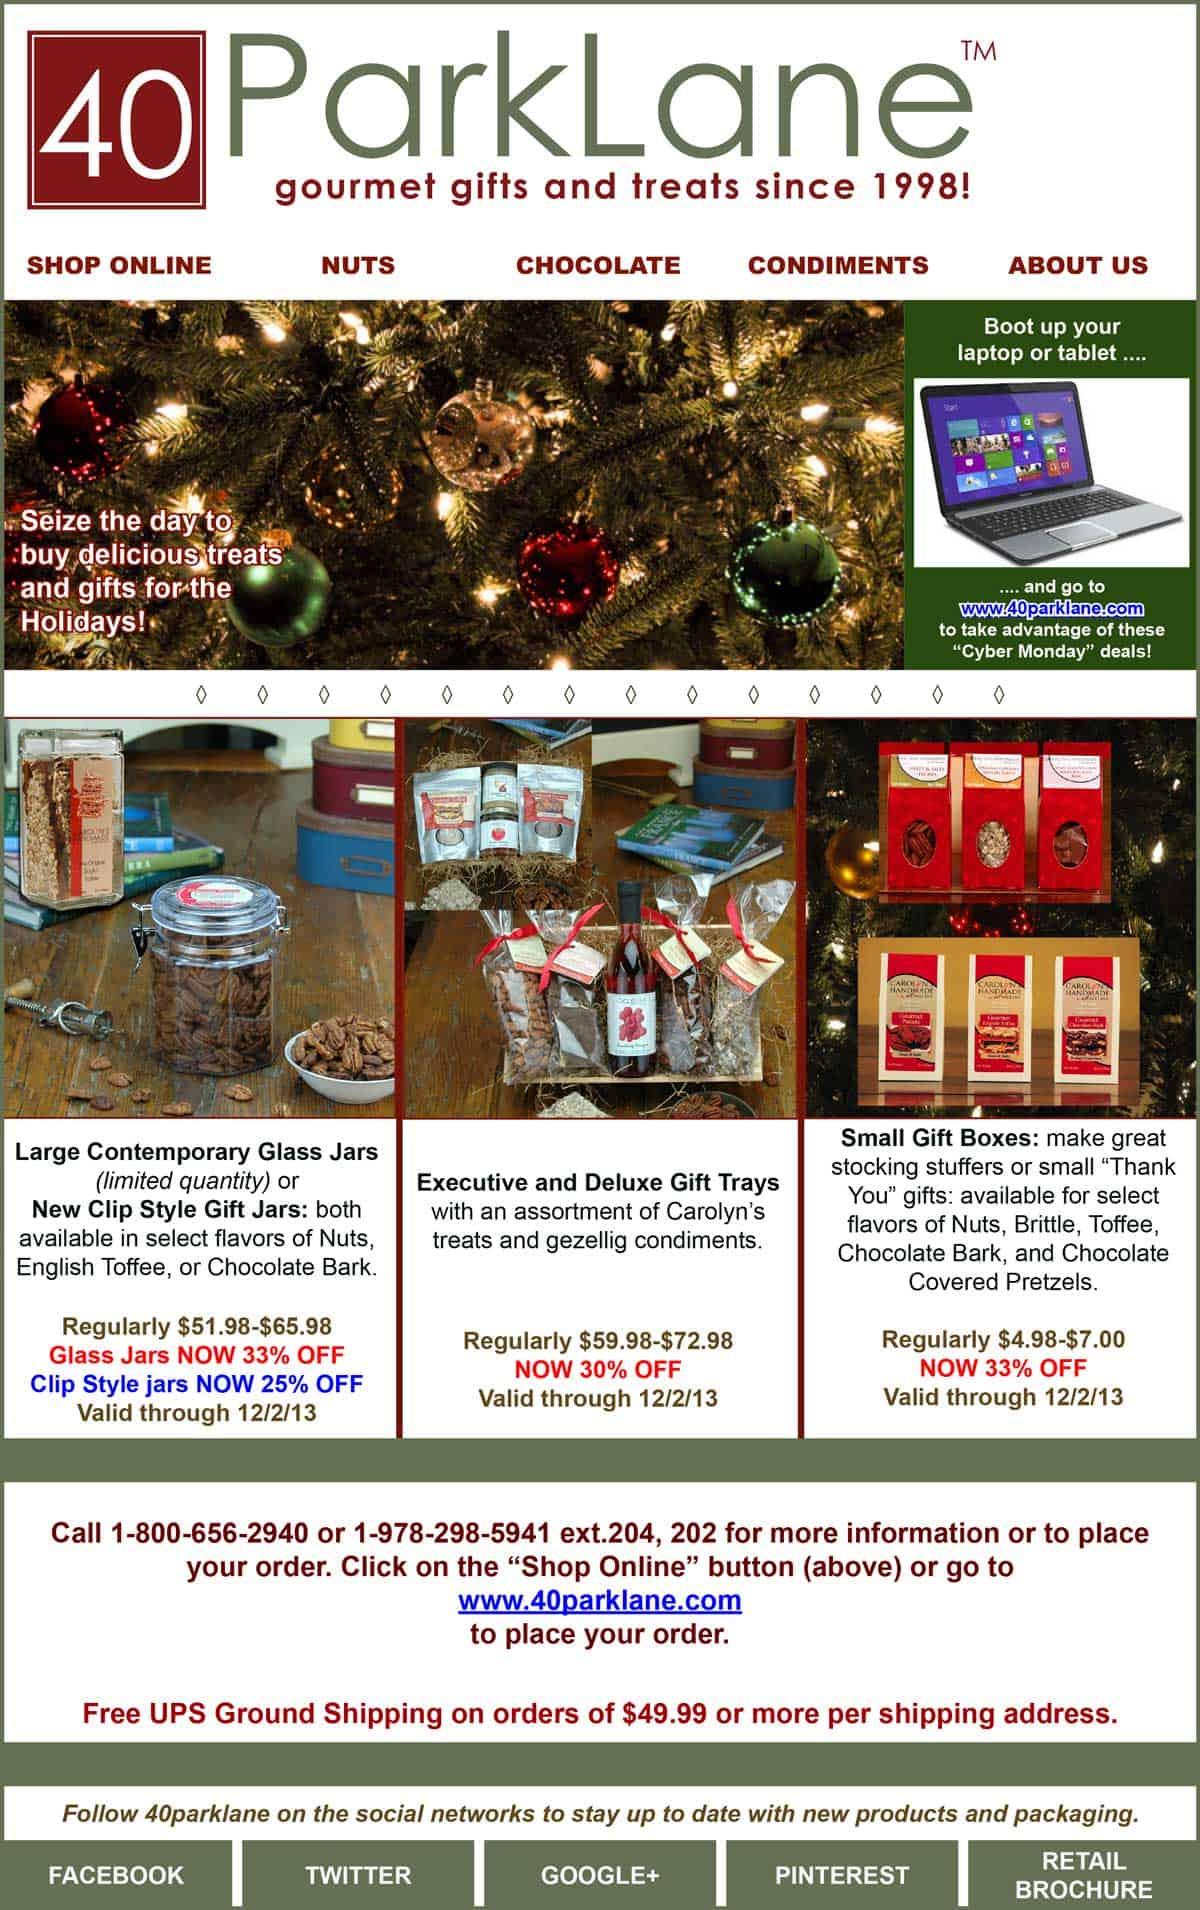 Email Marketing Portfolio - Get Ready for the Holidays - Email Campaign - 40Parklane